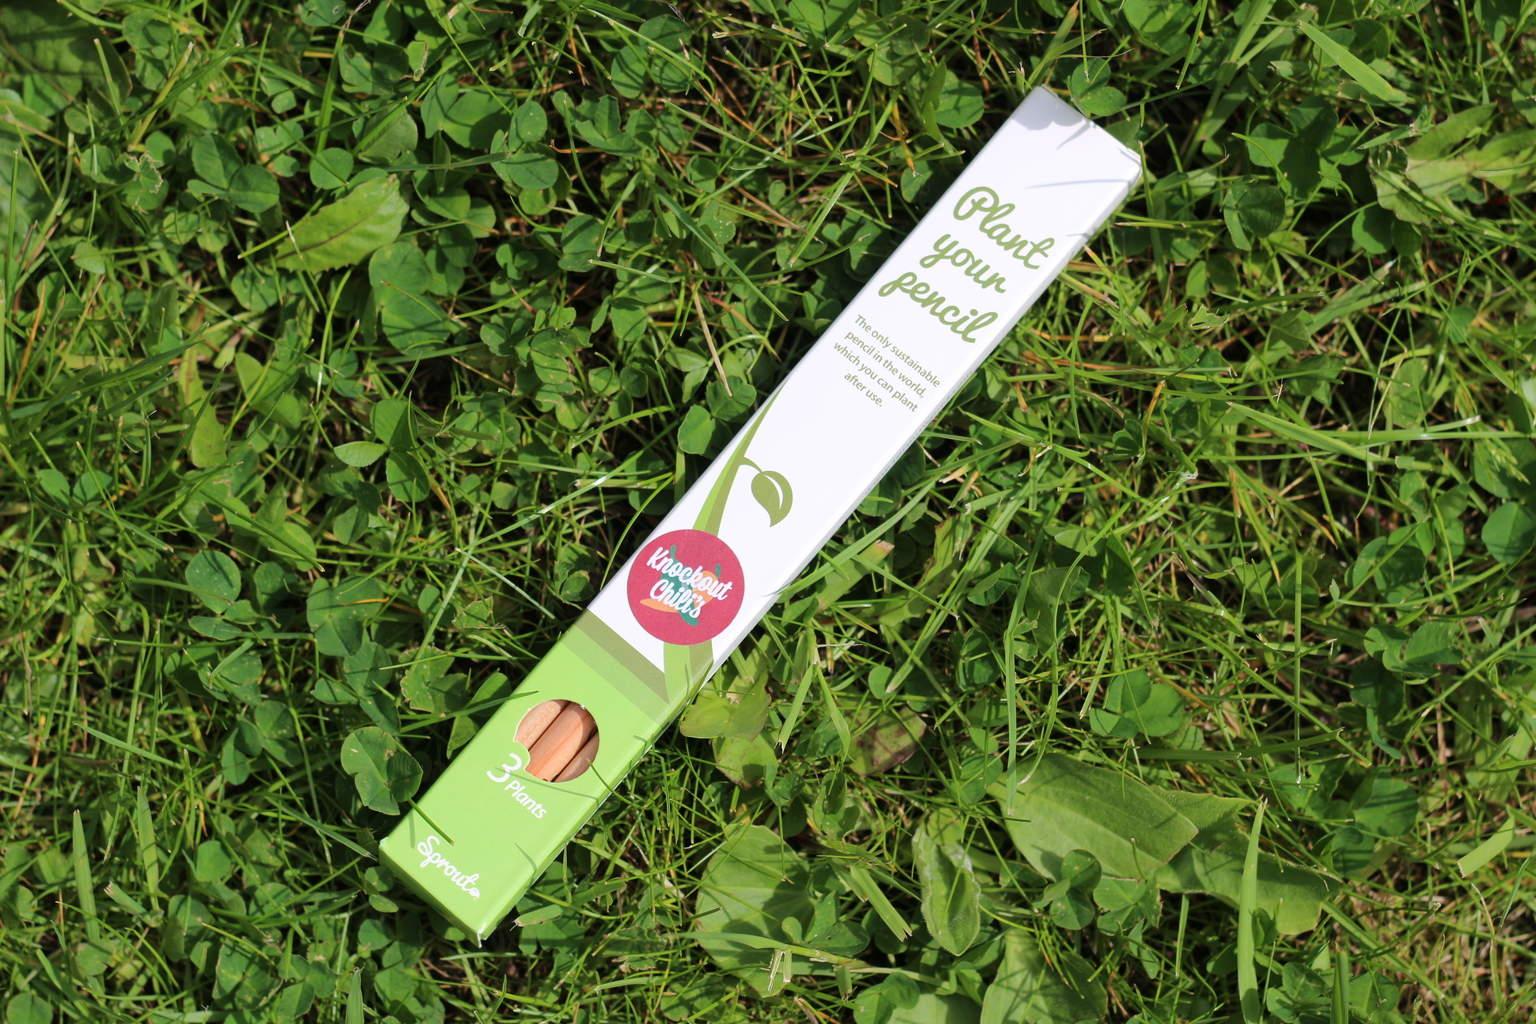 Sprout plantable chilli pencils